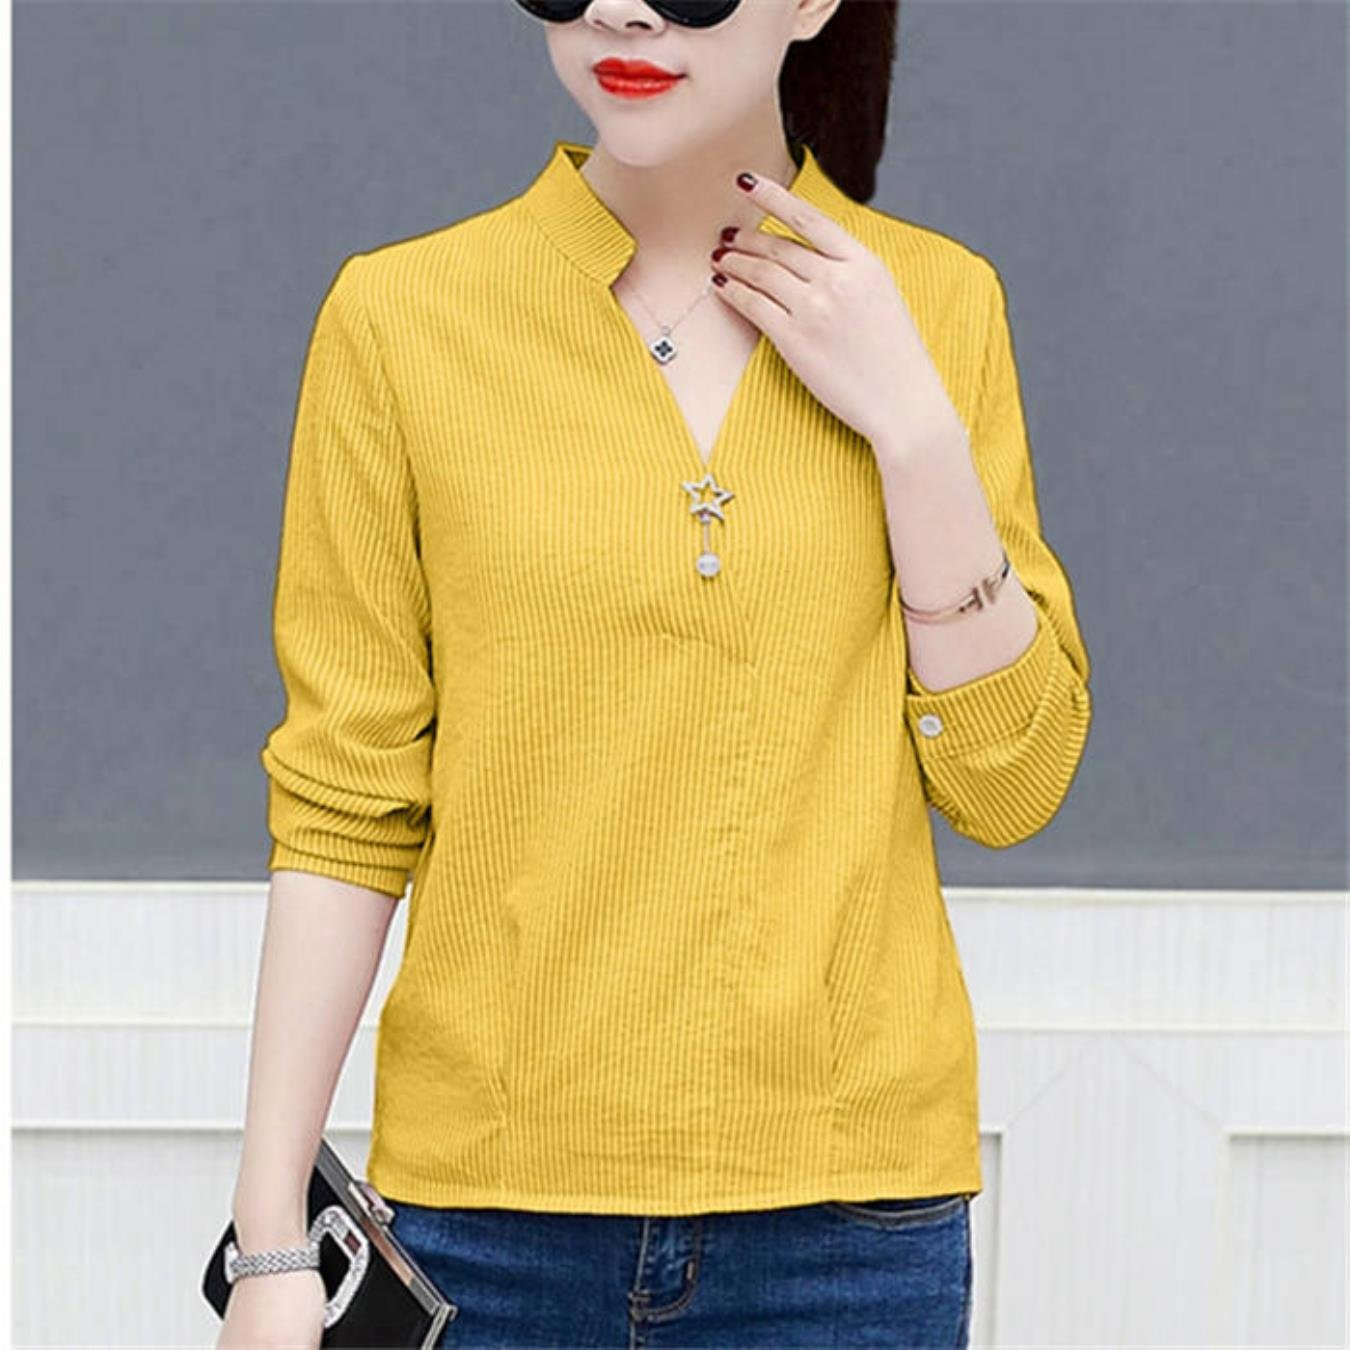 Long Sleeve Striped Blouses Women Shirts Back Button Slit Fashion V-Neck Office Shirt Women Tops